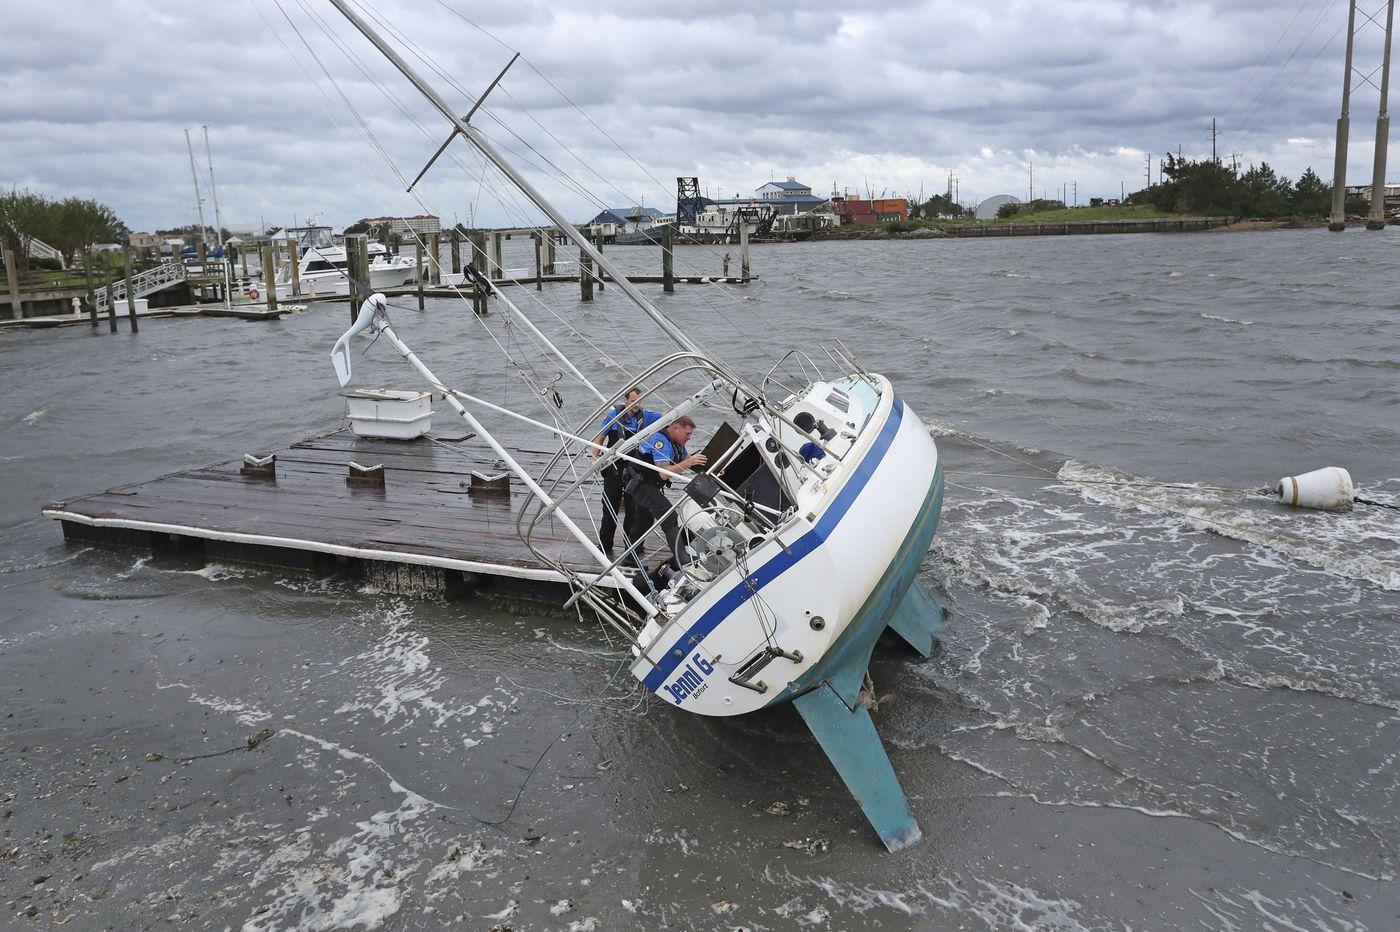 Hurricane Dorian's floodwaters trap people in attics in North Carolina